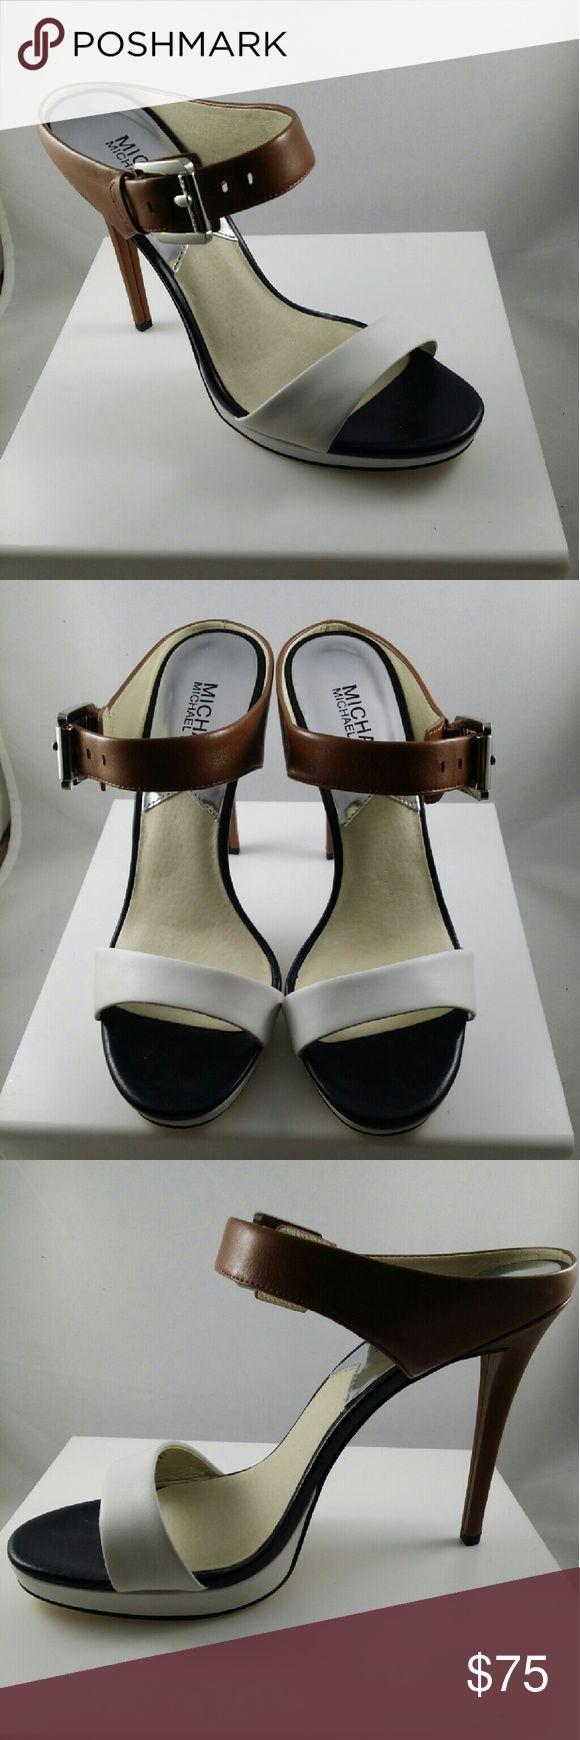 "MICHAEL KORS BEVERLY HEELS New in box, Michael Kors Beverly heels. 4.5"" heels with .5""platform Michael Kors Shoes Heels"